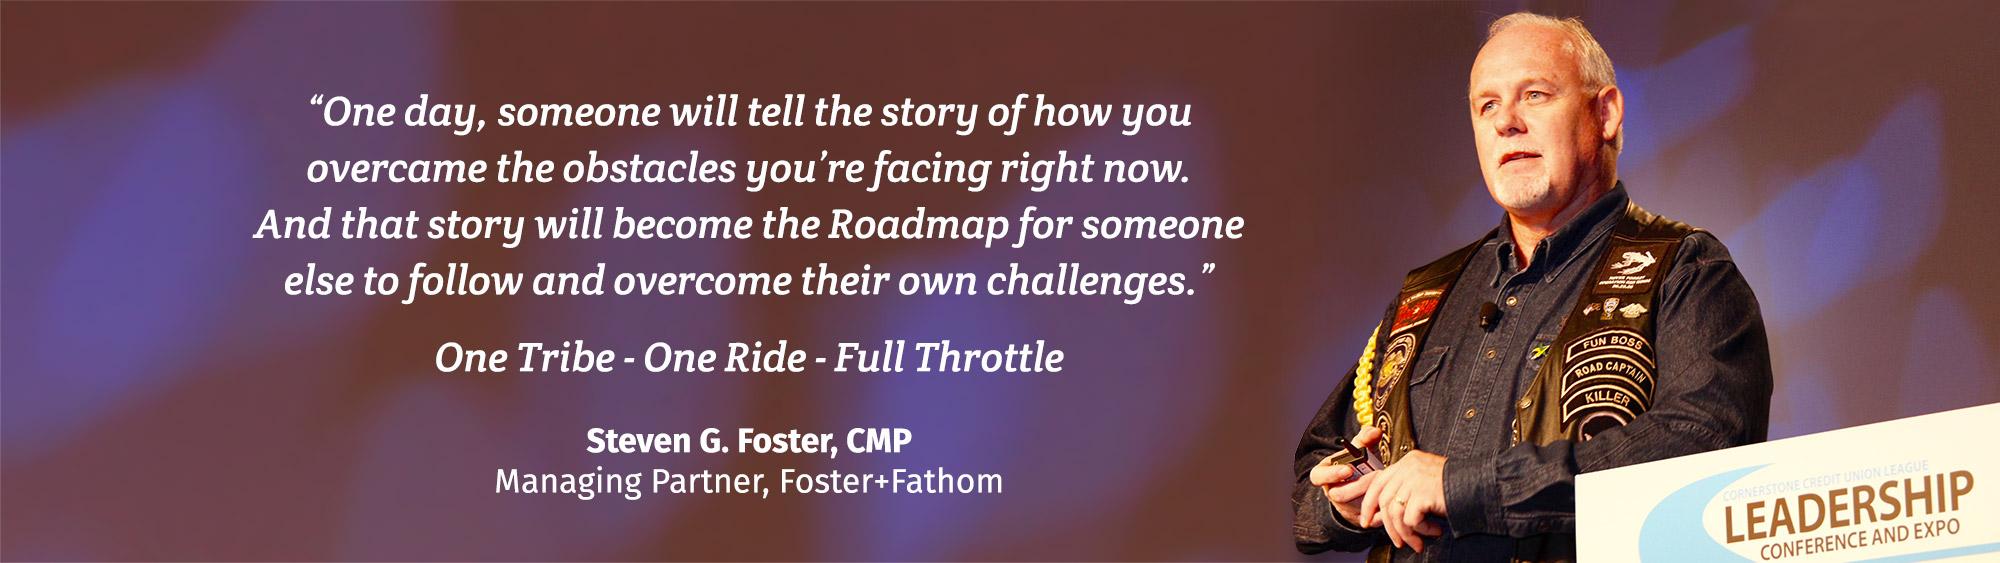 Steven G. Foster, CMP - Managing Partner, Foster+Fathom